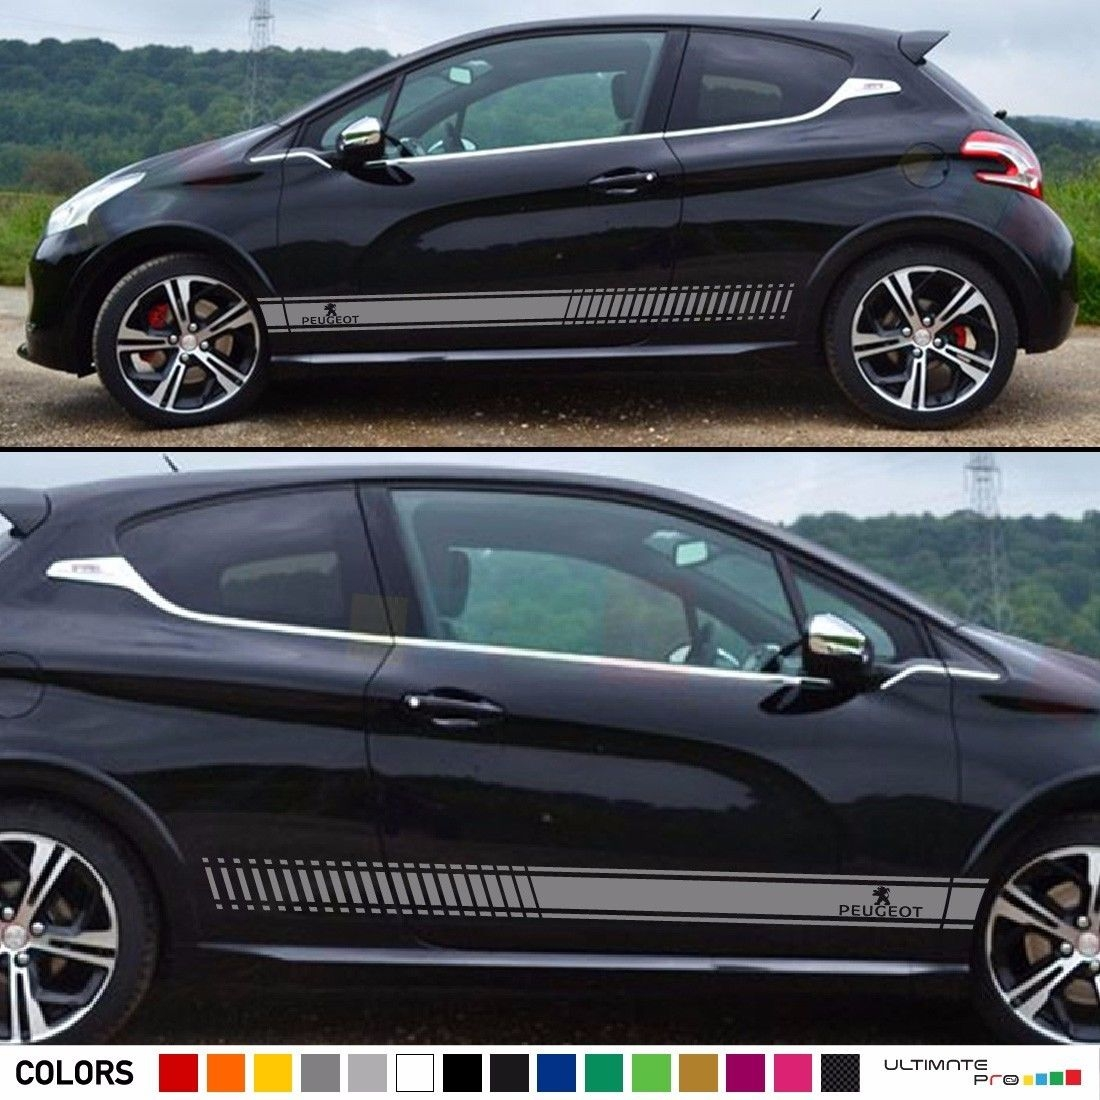 Stickers Peugeot Sticker Auto Logo ref13 Tuning Sticker Car